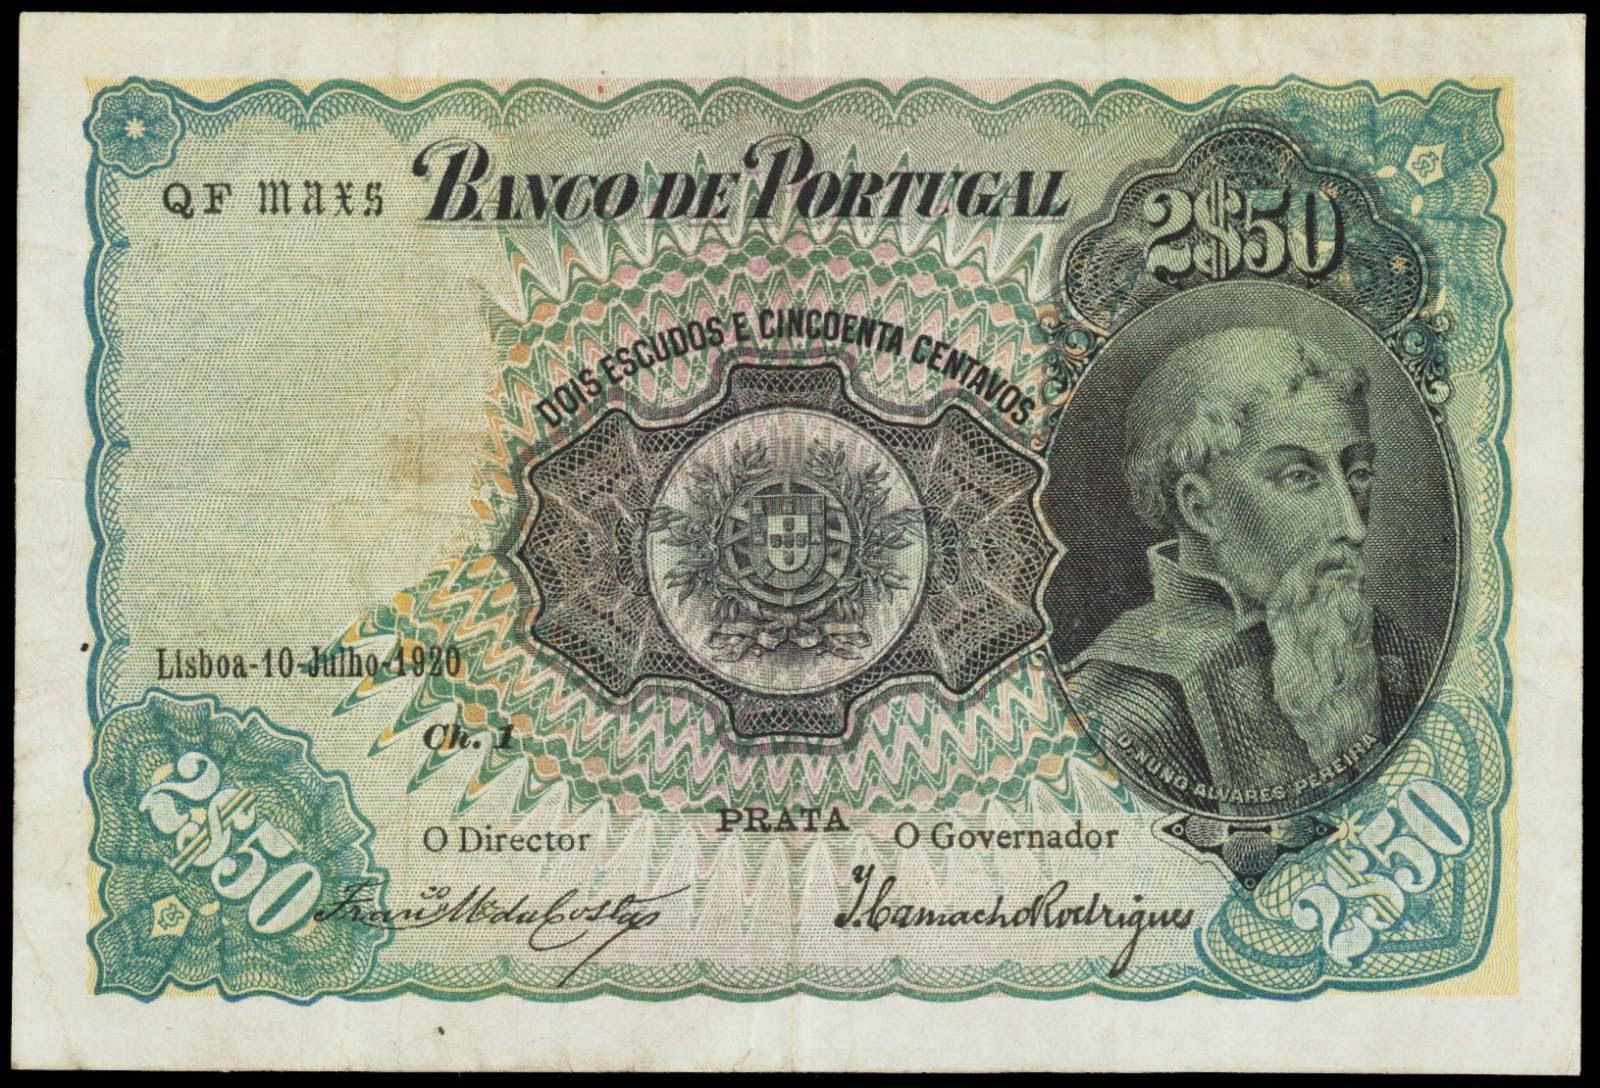 Portugal banknotes 2 Escudos 50 Centavos 1920 Nuno Alvares Pereira